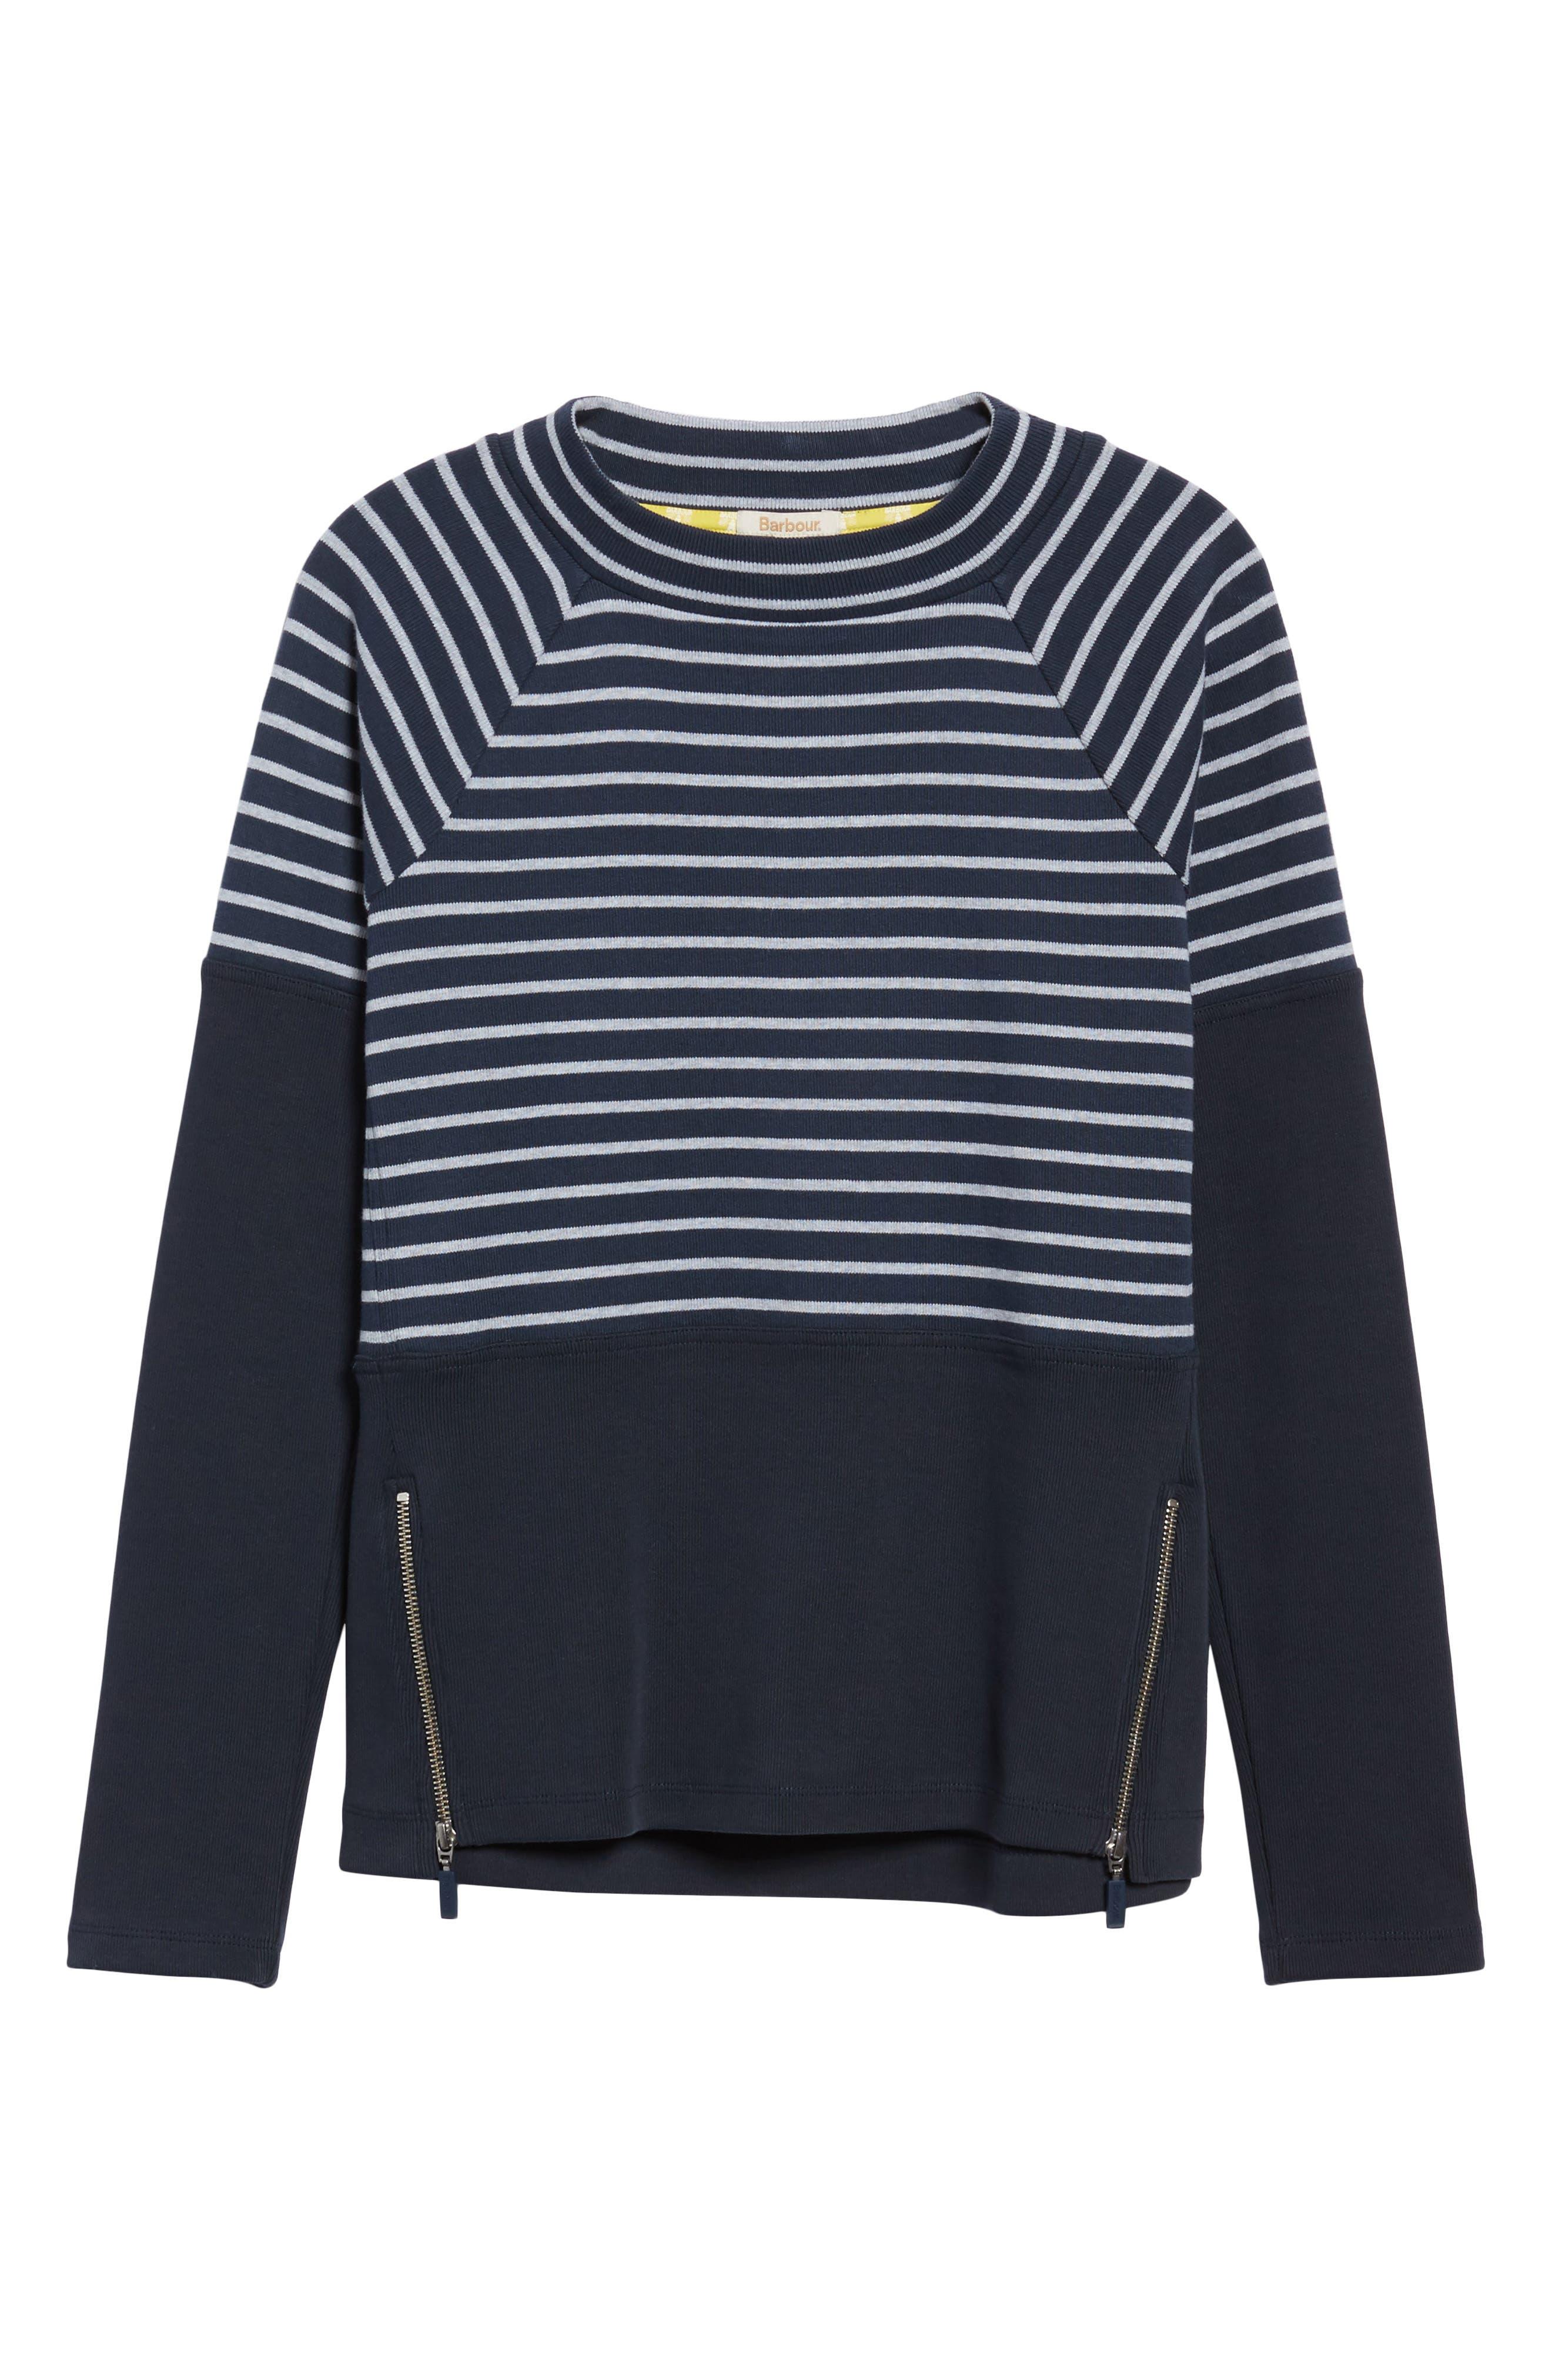 Seaburn Stripe Sweatshirt,                             Alternate thumbnail 6, color,                             Navy/ Grey